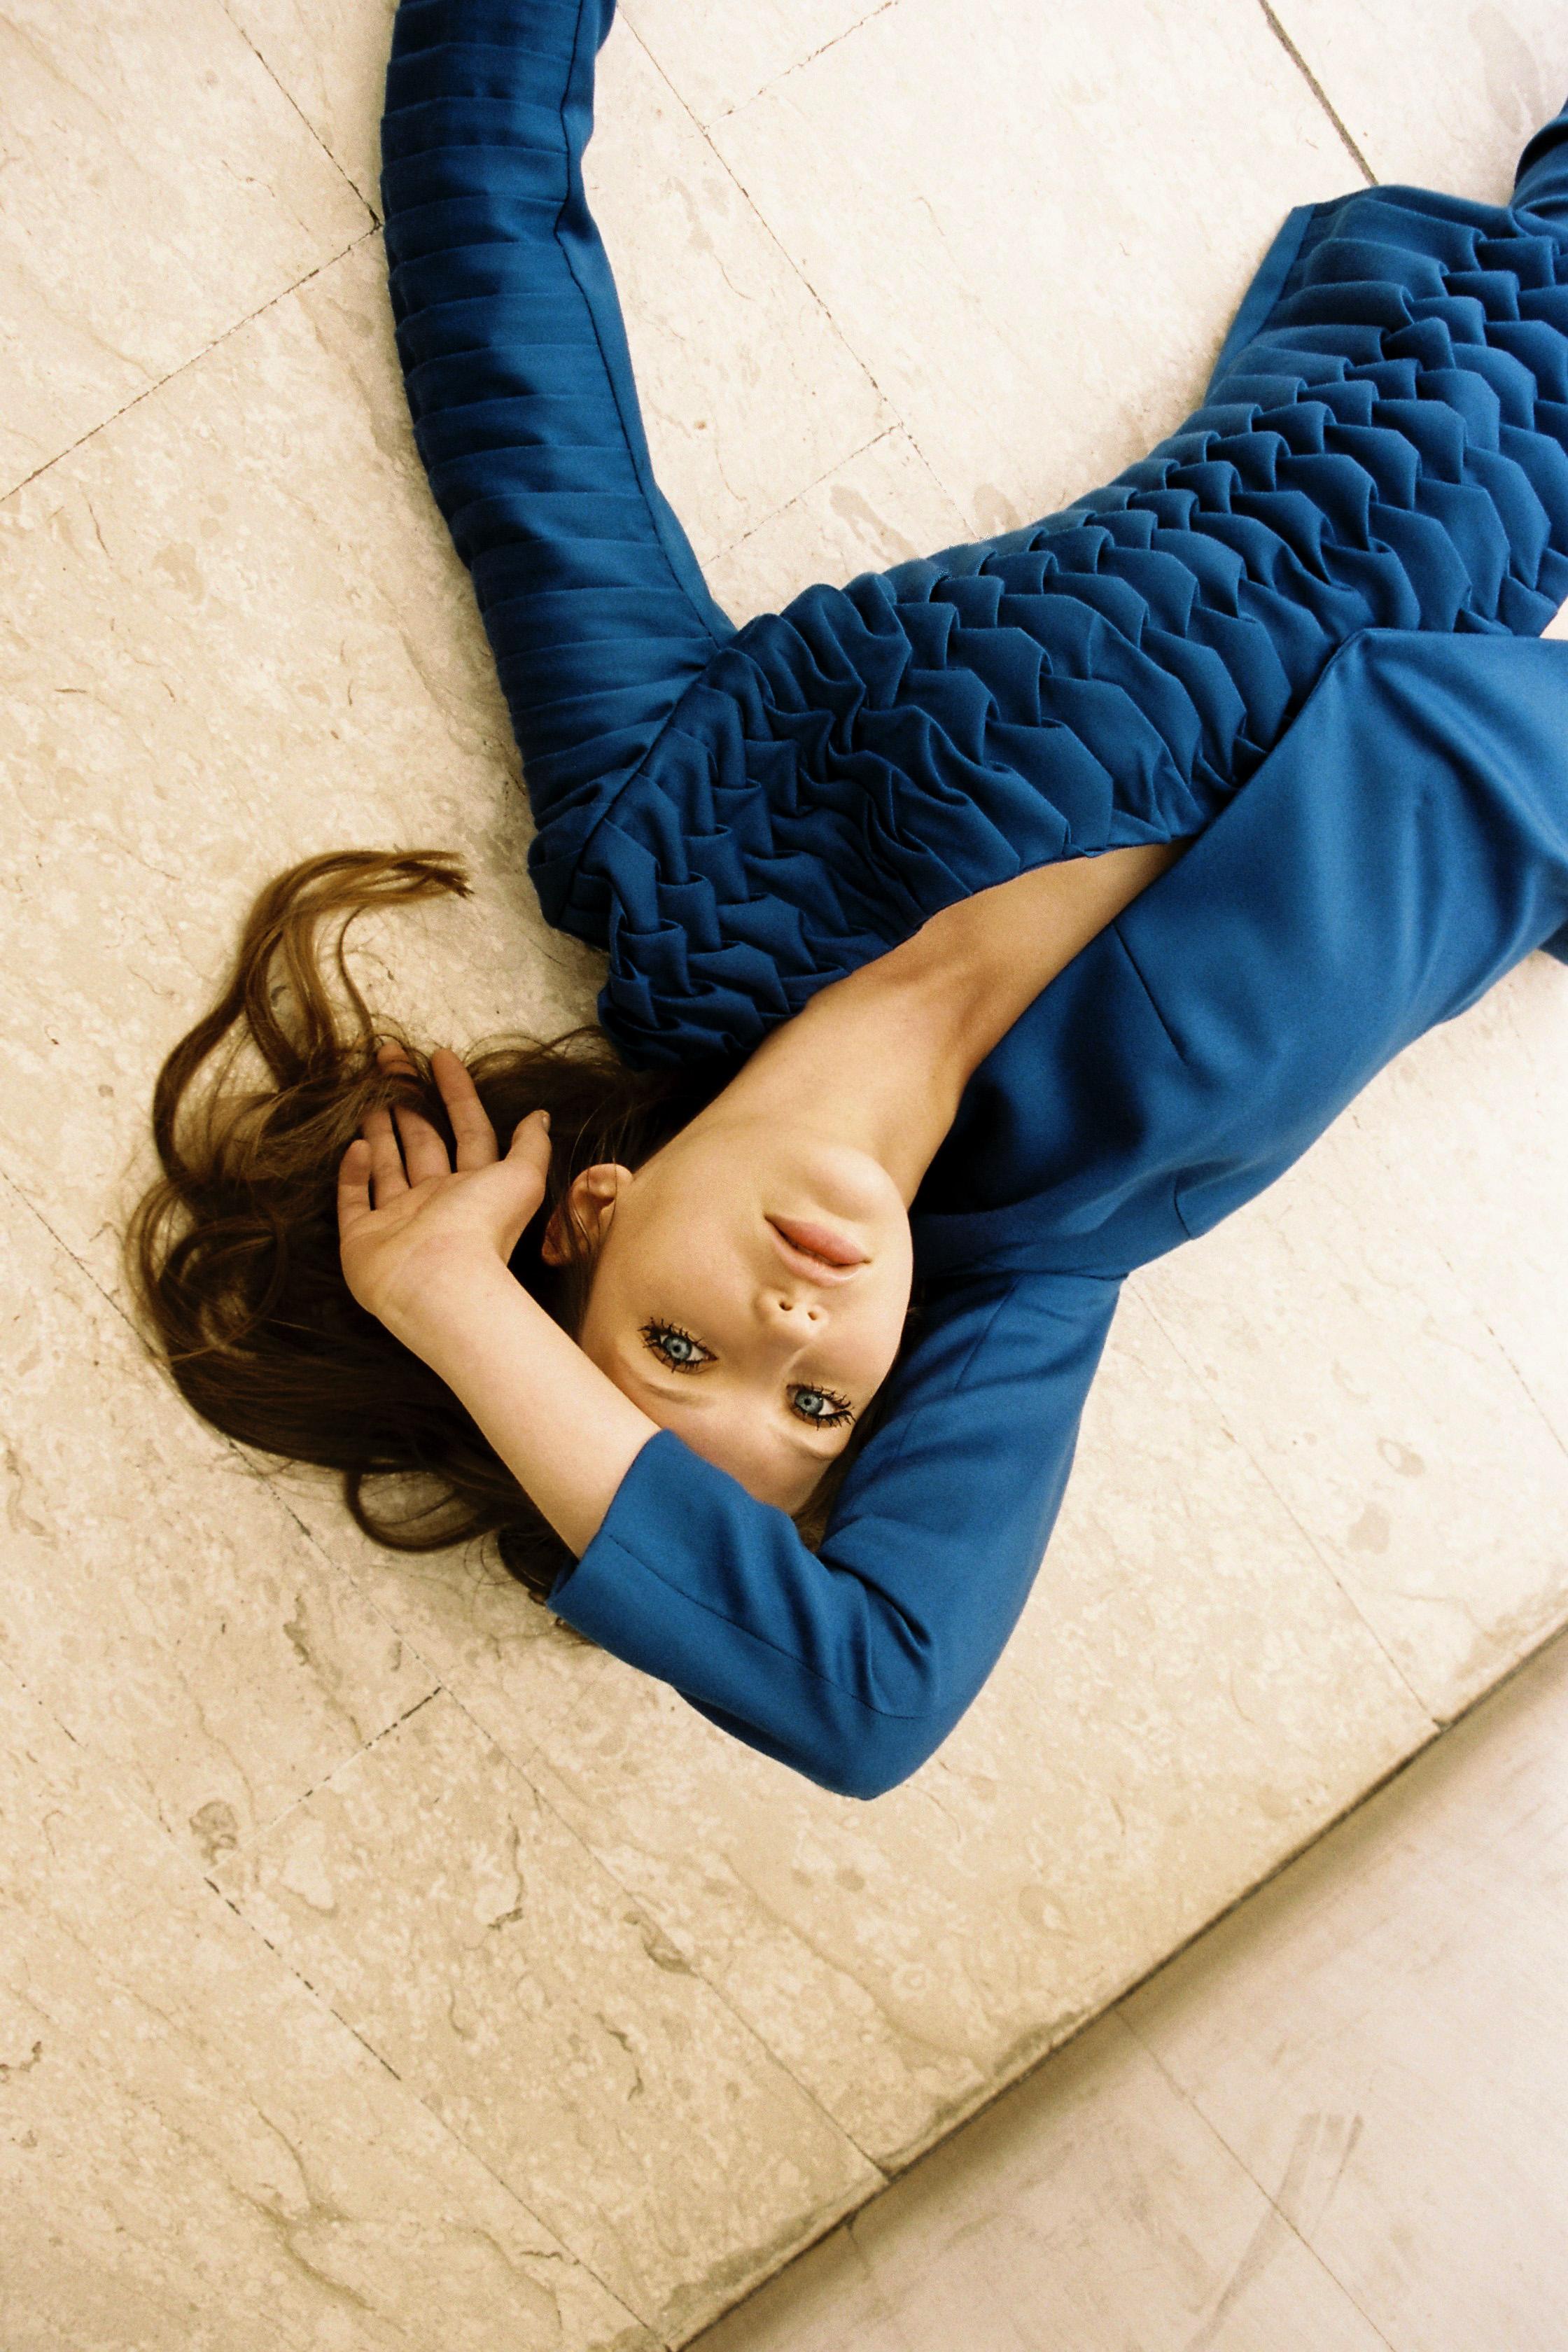 Suit / Jacket and Pants: Zorana Janjic